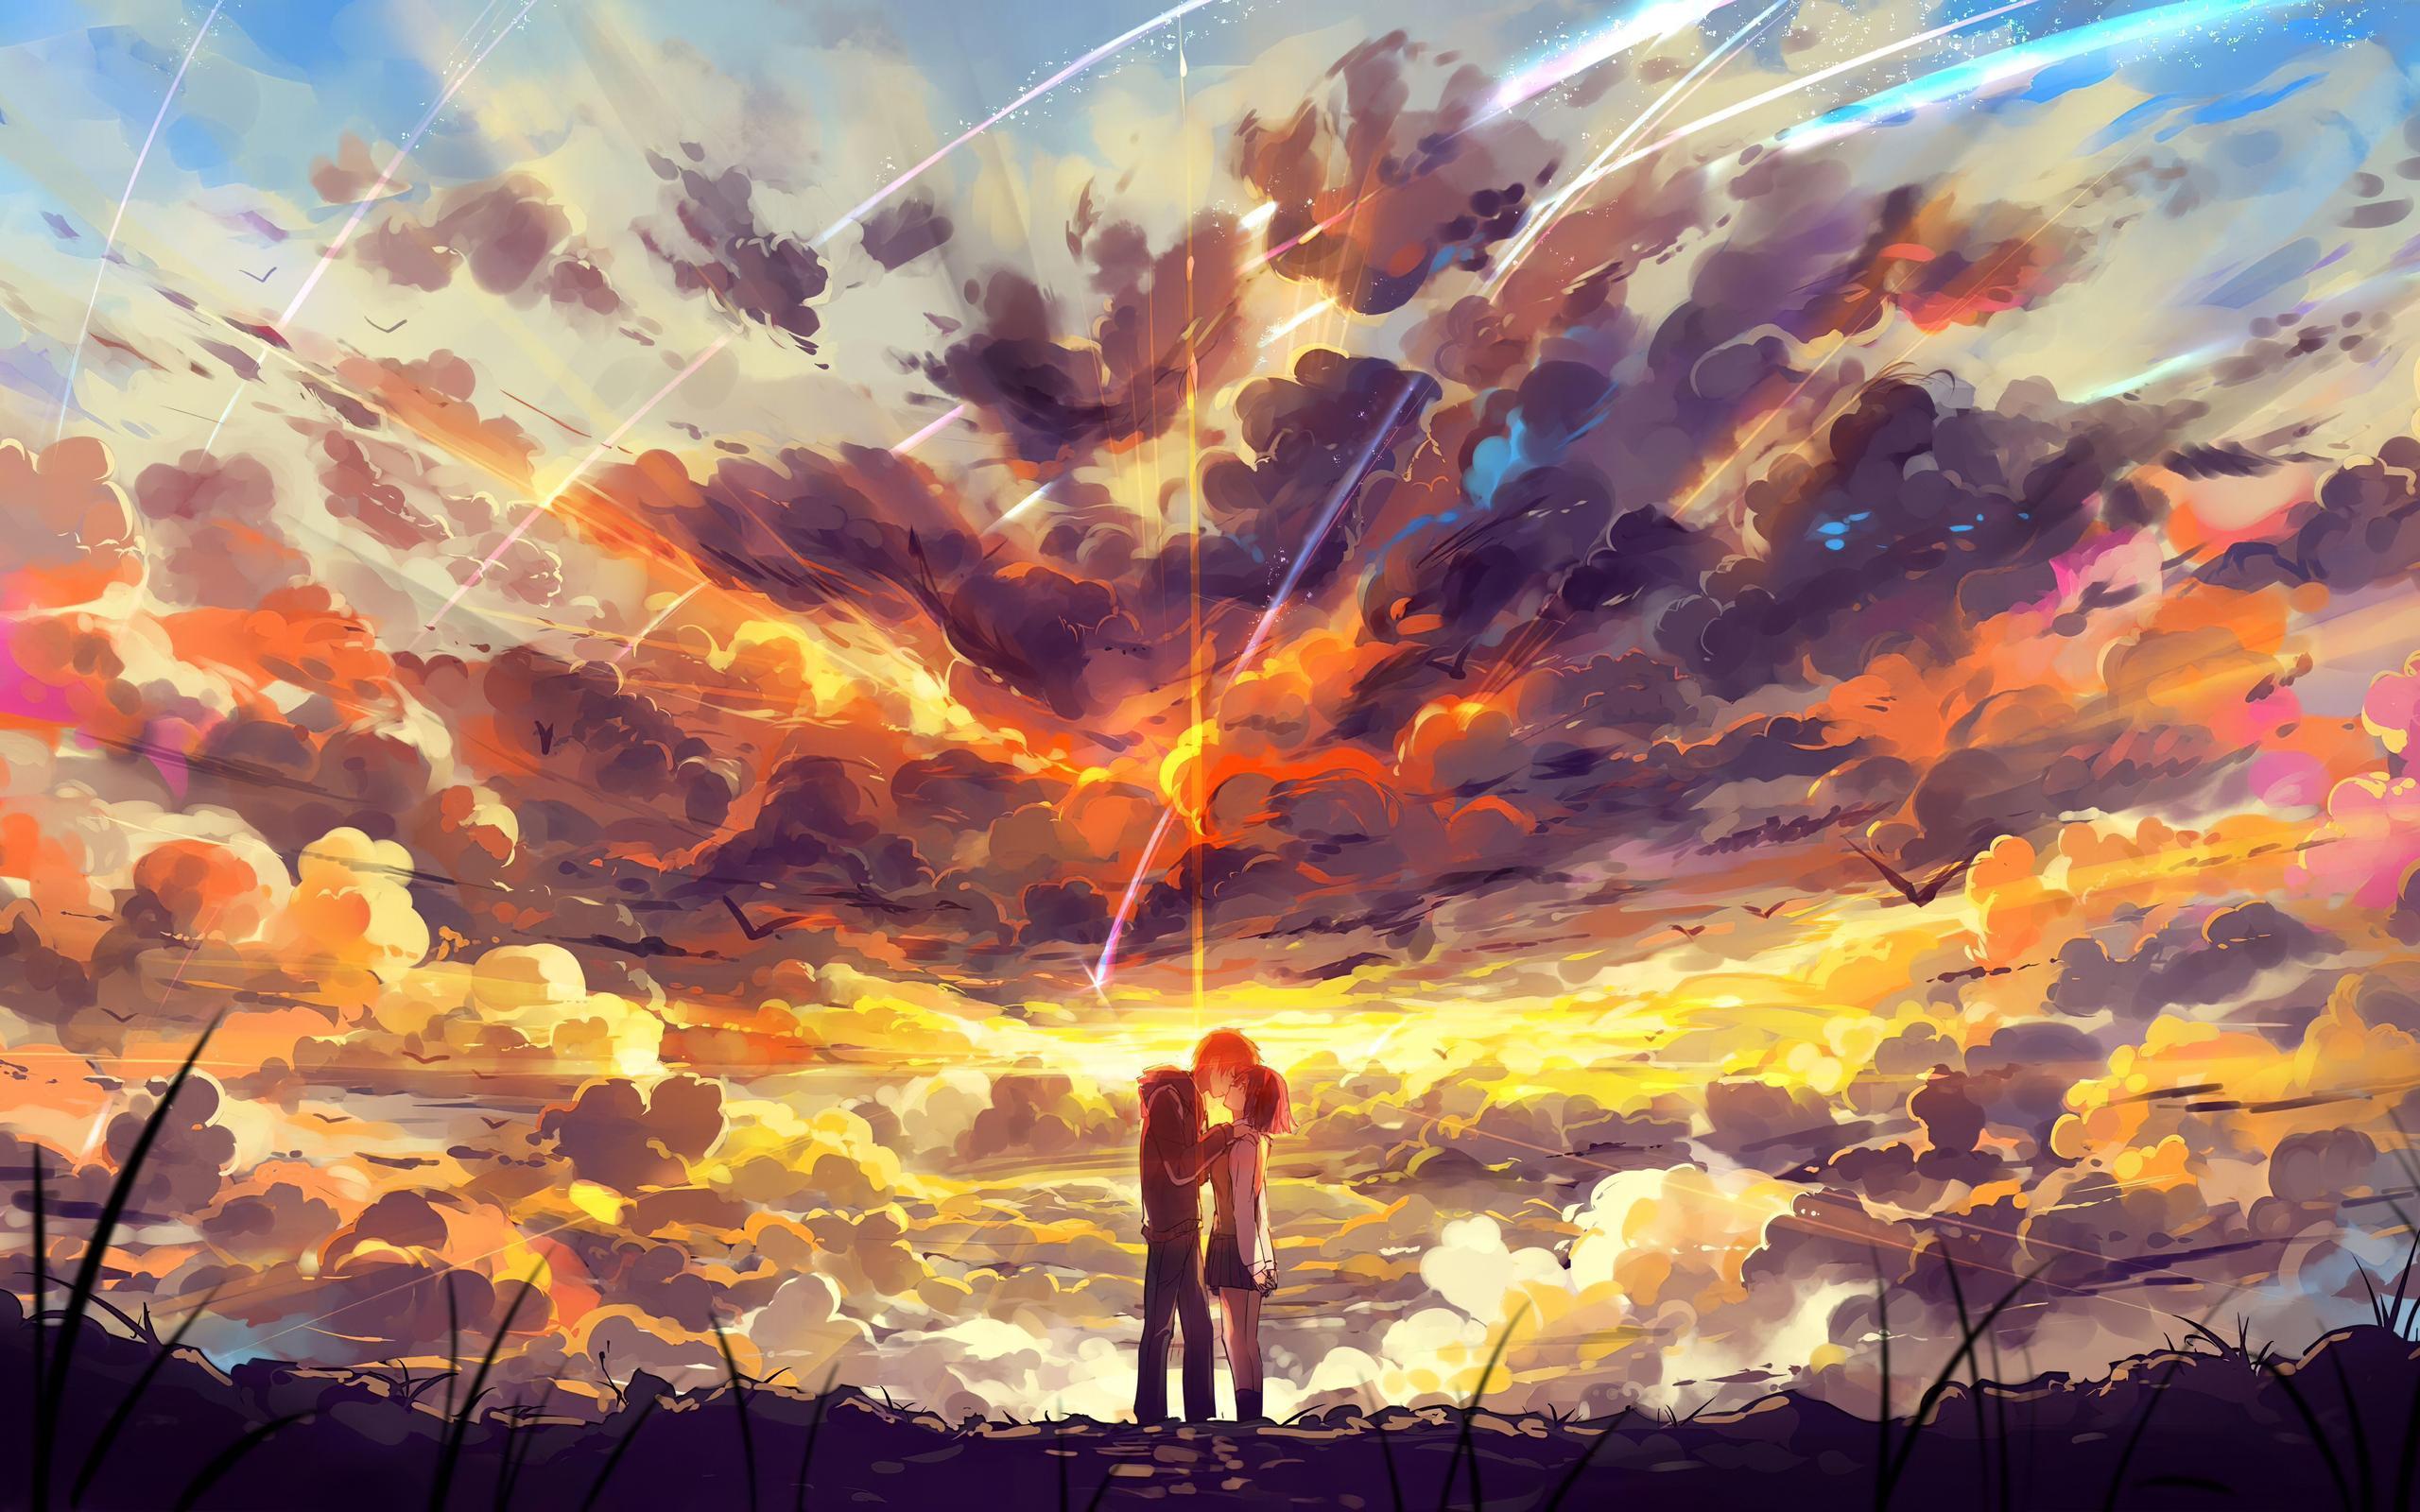 2560x1600 Kimi No Nawa Anime Couple 5k 2560x1600 ...